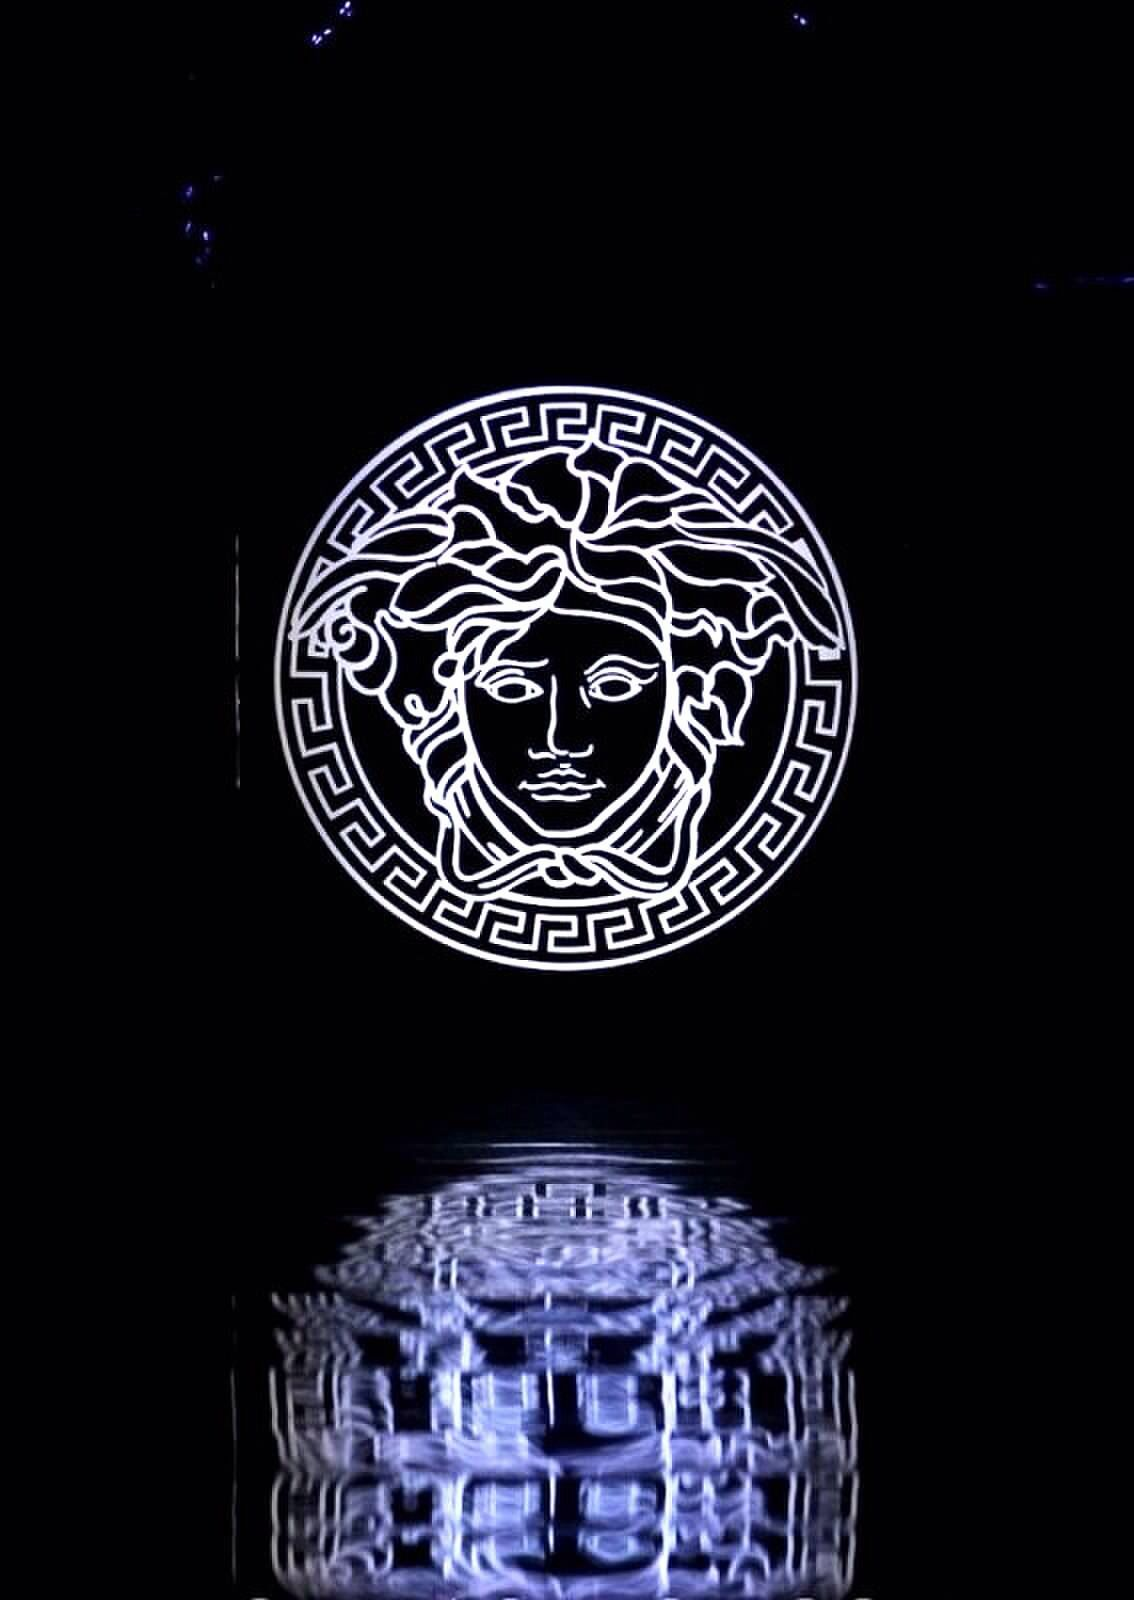 Versace Medusa Head Fondo De Pantalla Pintura Fondo De Pantalla